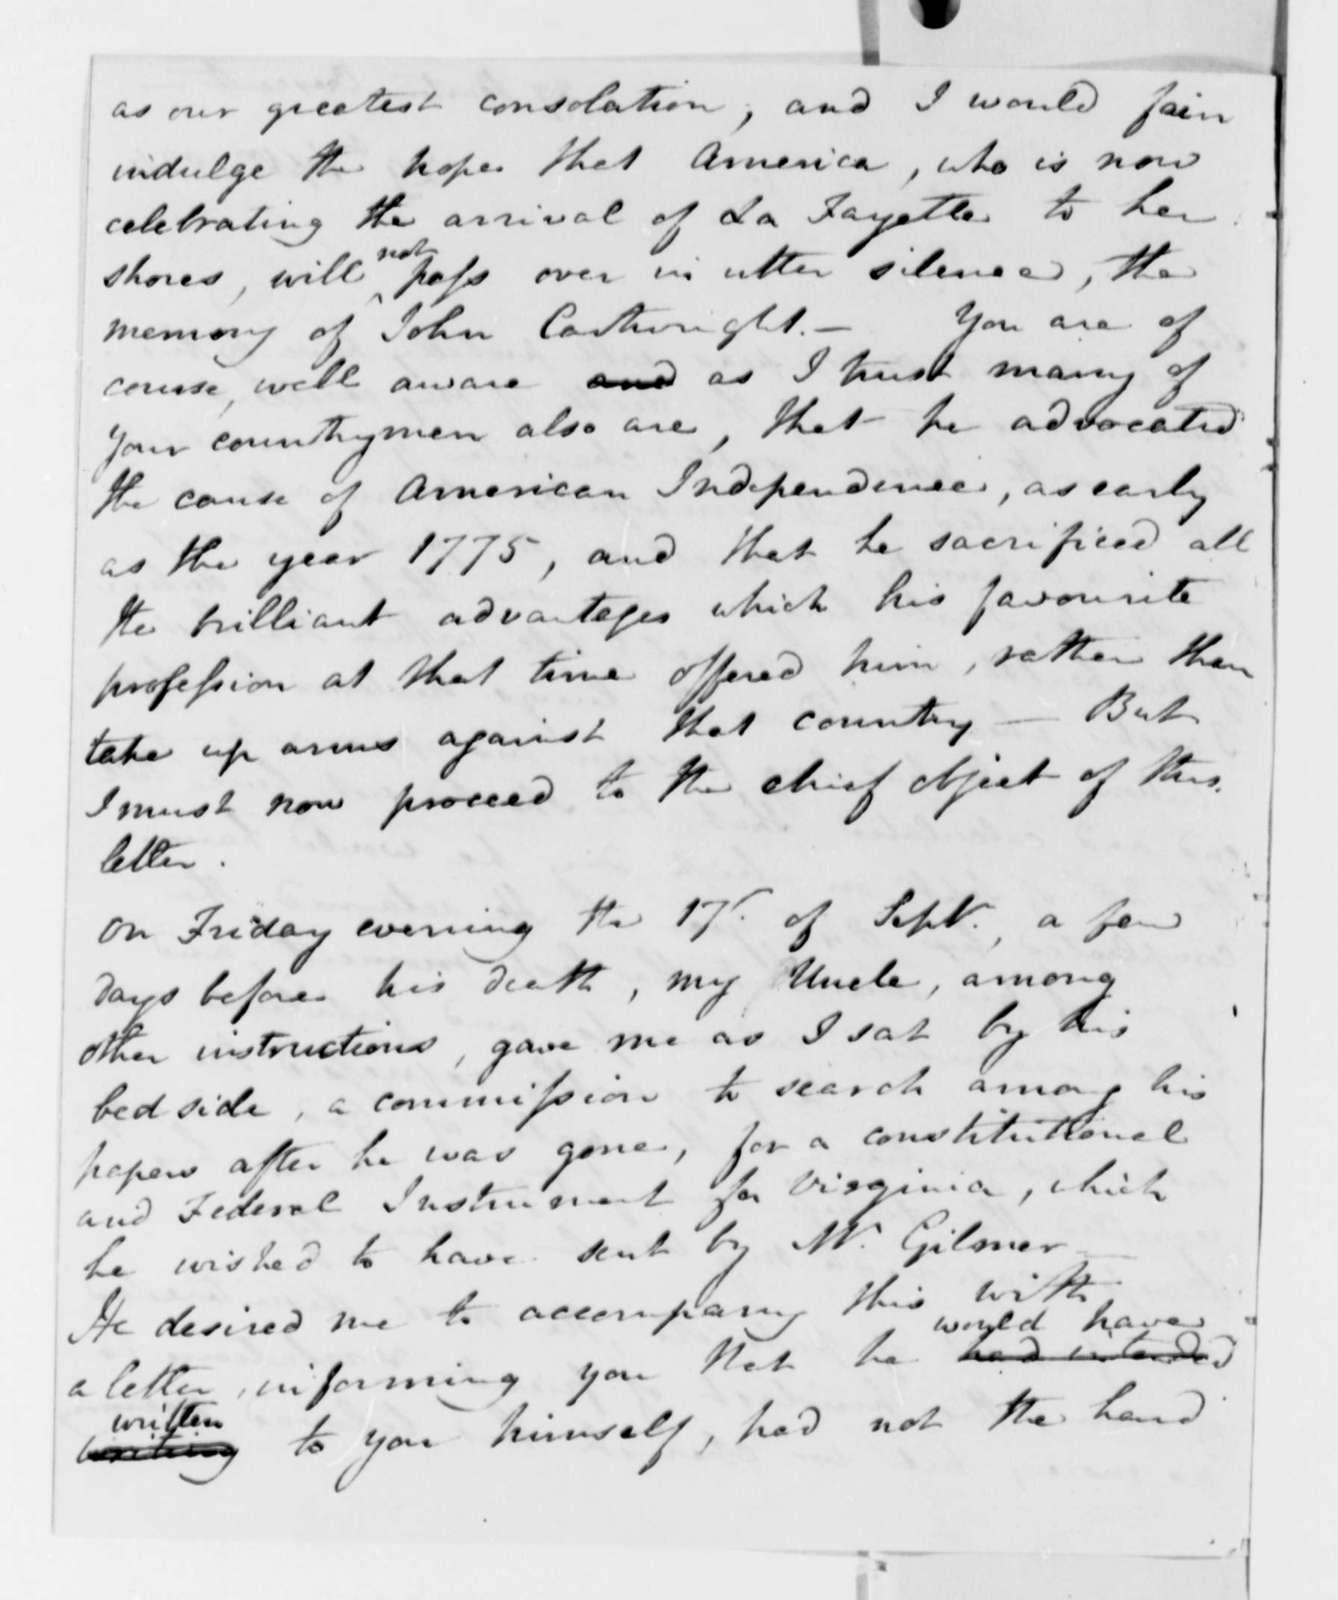 Frances D. Cartwright to Thomas Jefferson, September 29, 1824